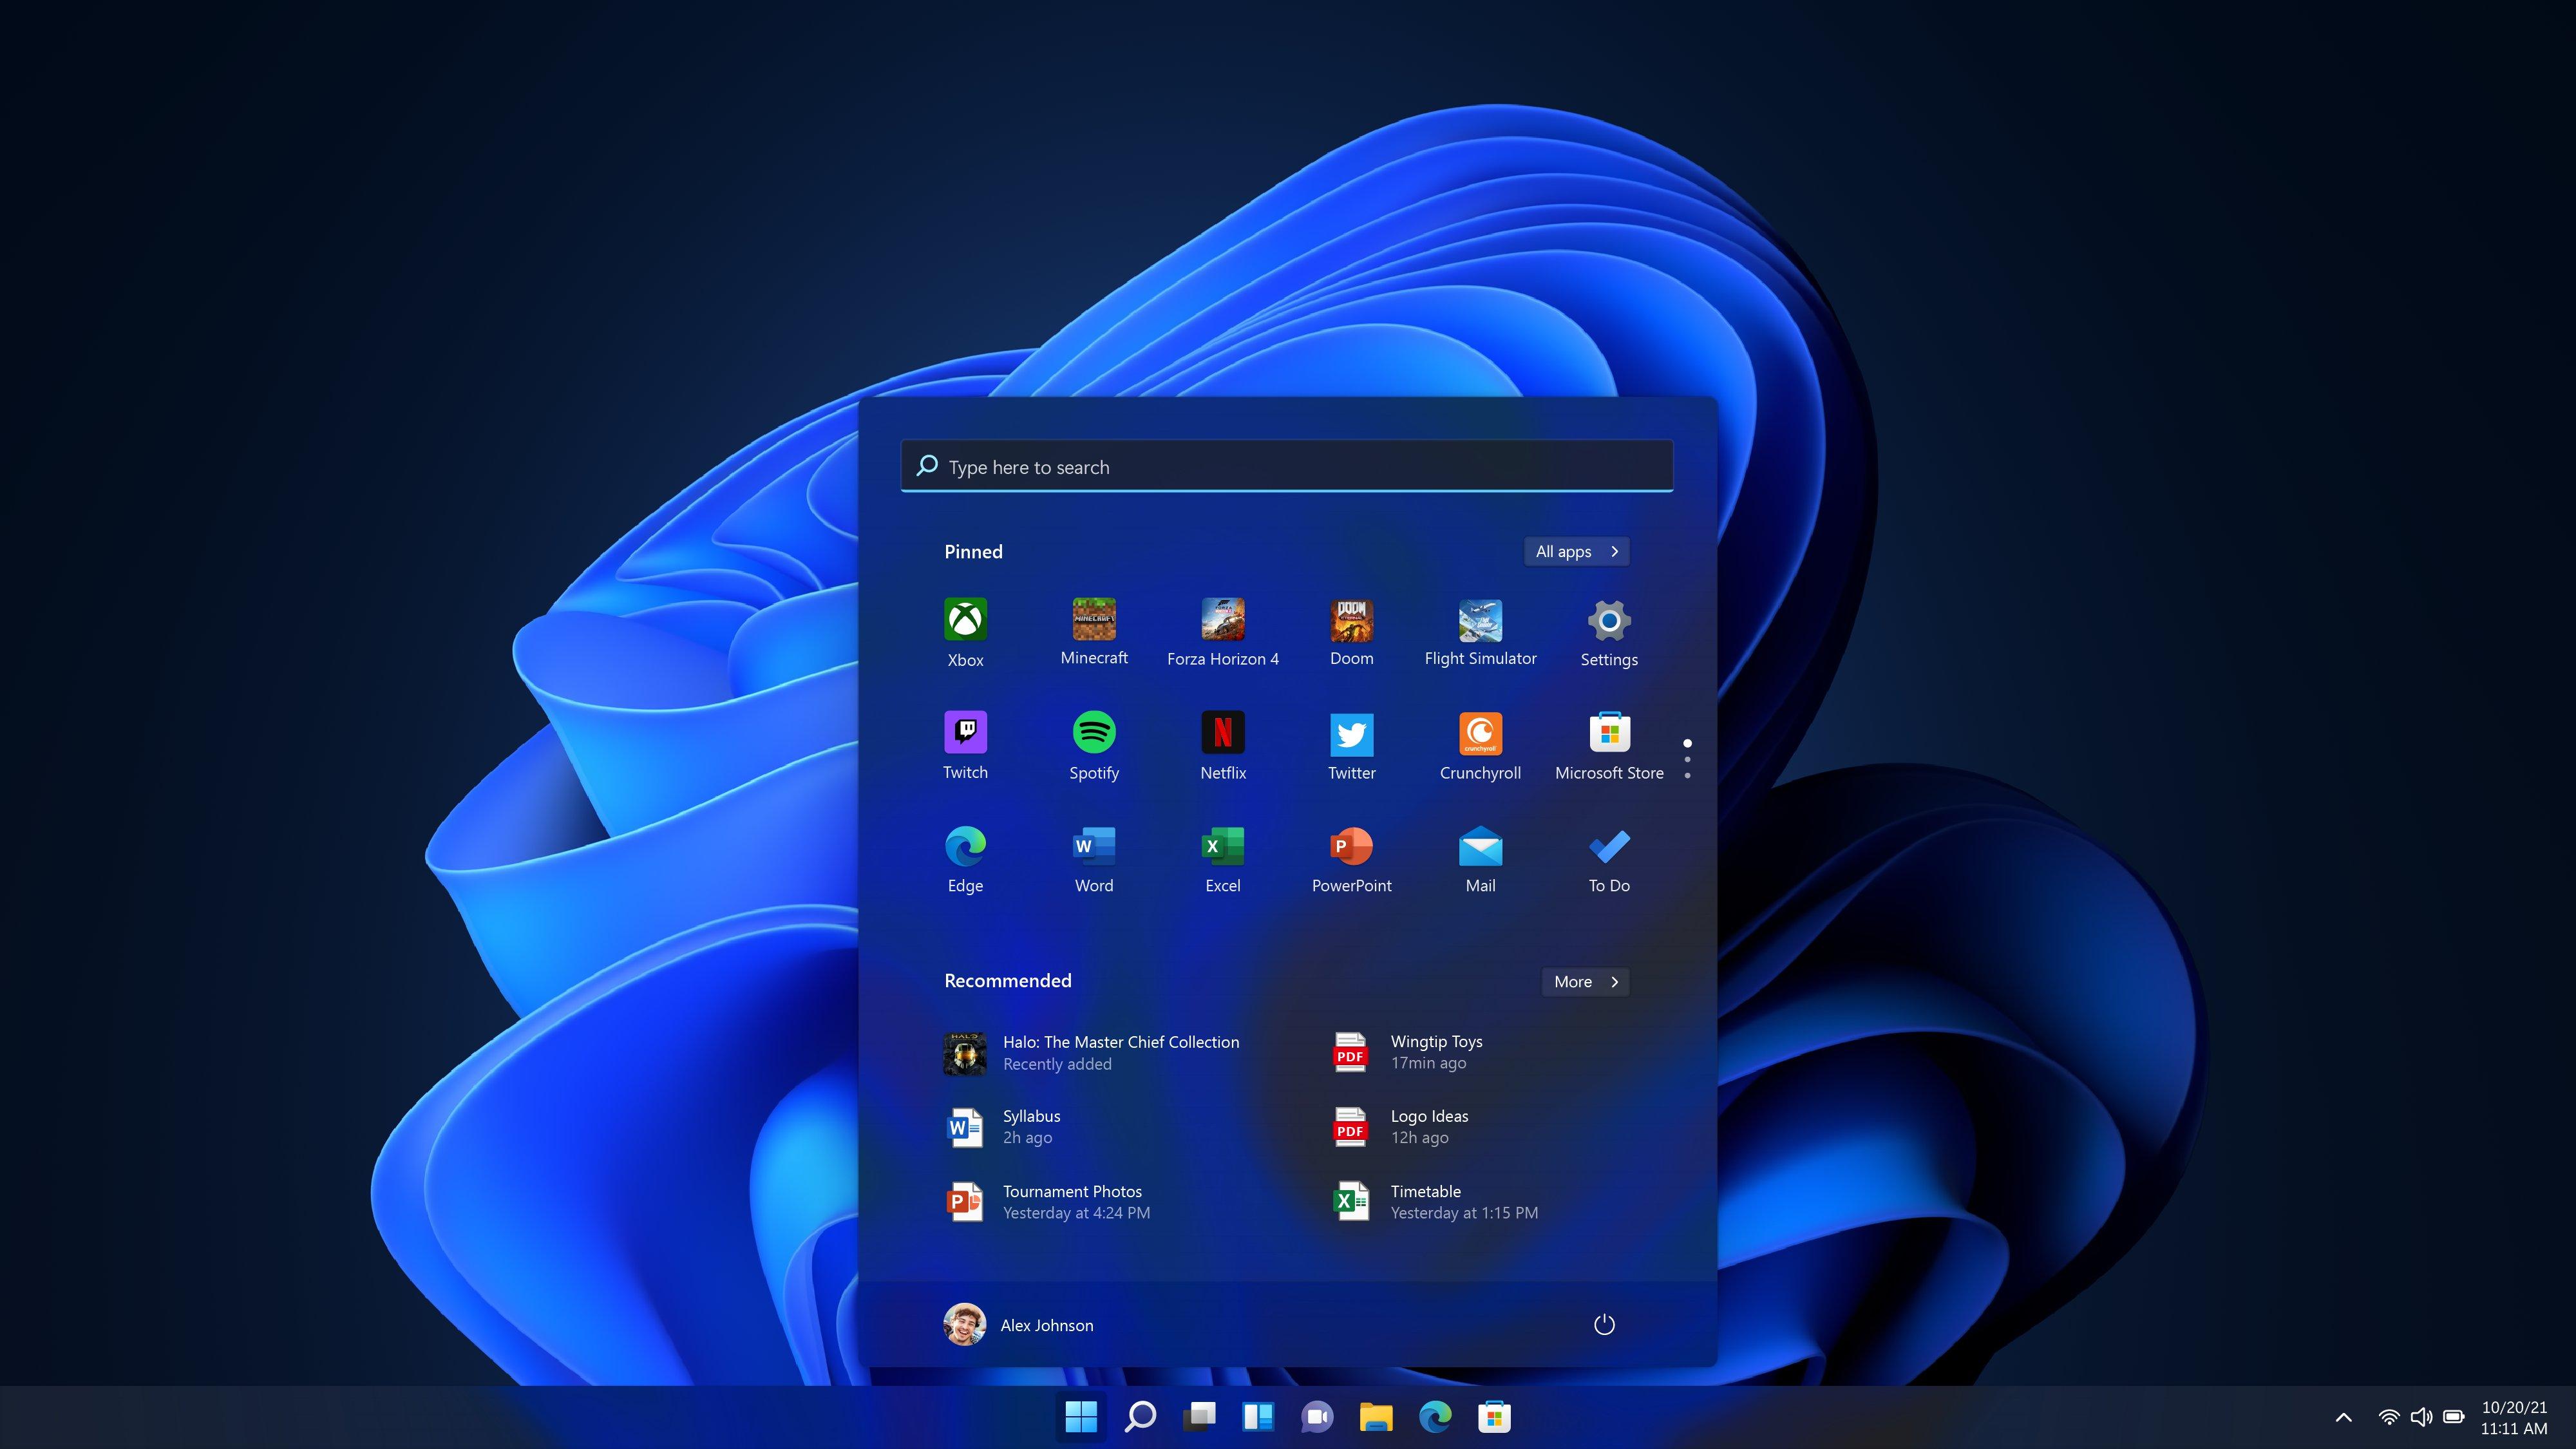 The new Windows 11 Start menu